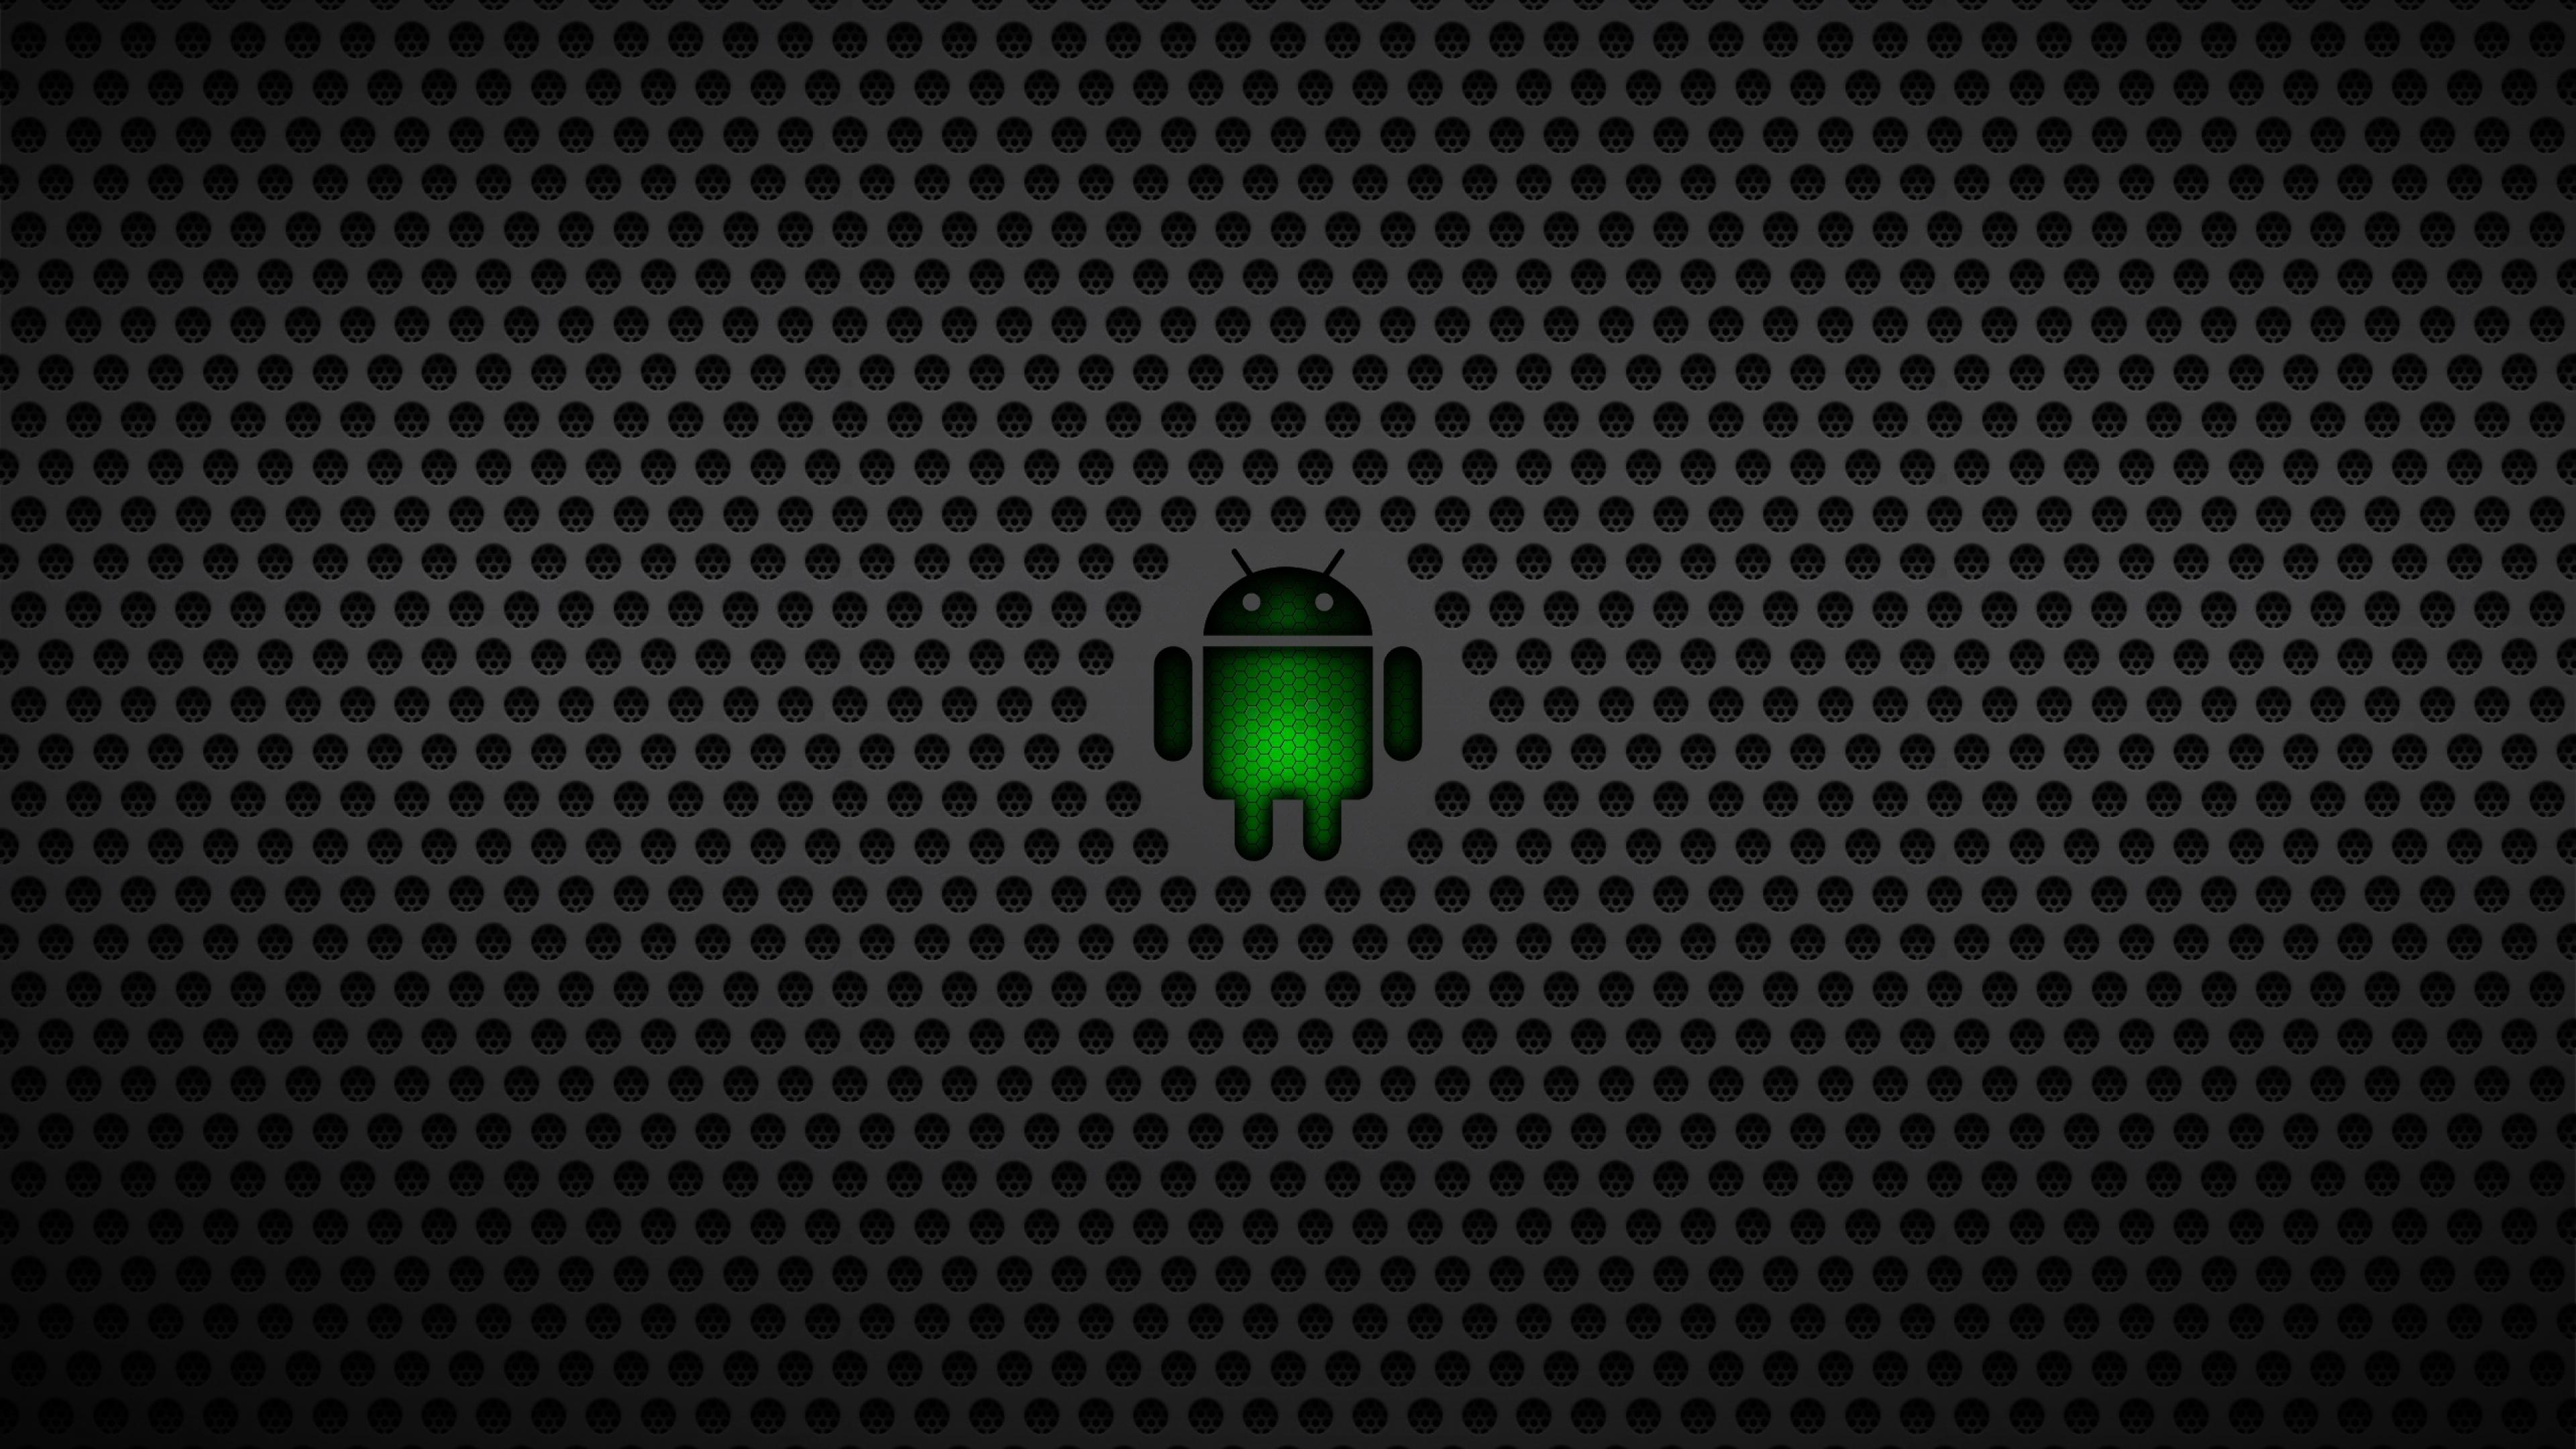 Ultra HD 3840x2160 Android Wallpaper - WallpaperSafari